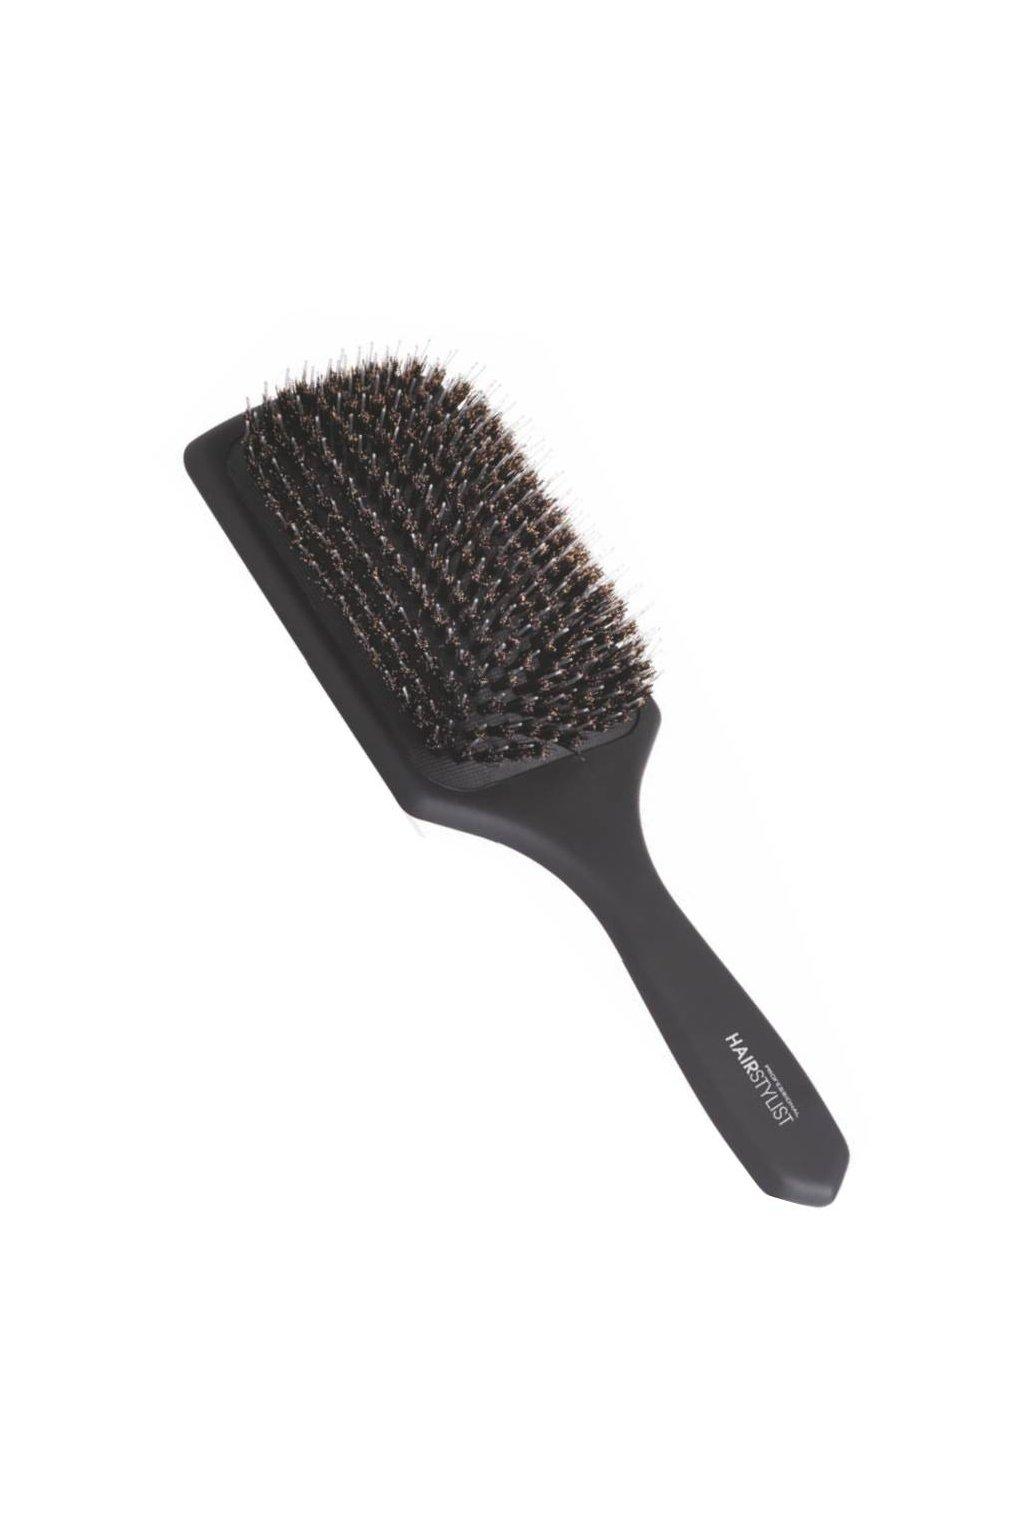 8006 kartac hair stylist cerny plochy siroky kanci stetiny nylonove ostny 25x8x4cm